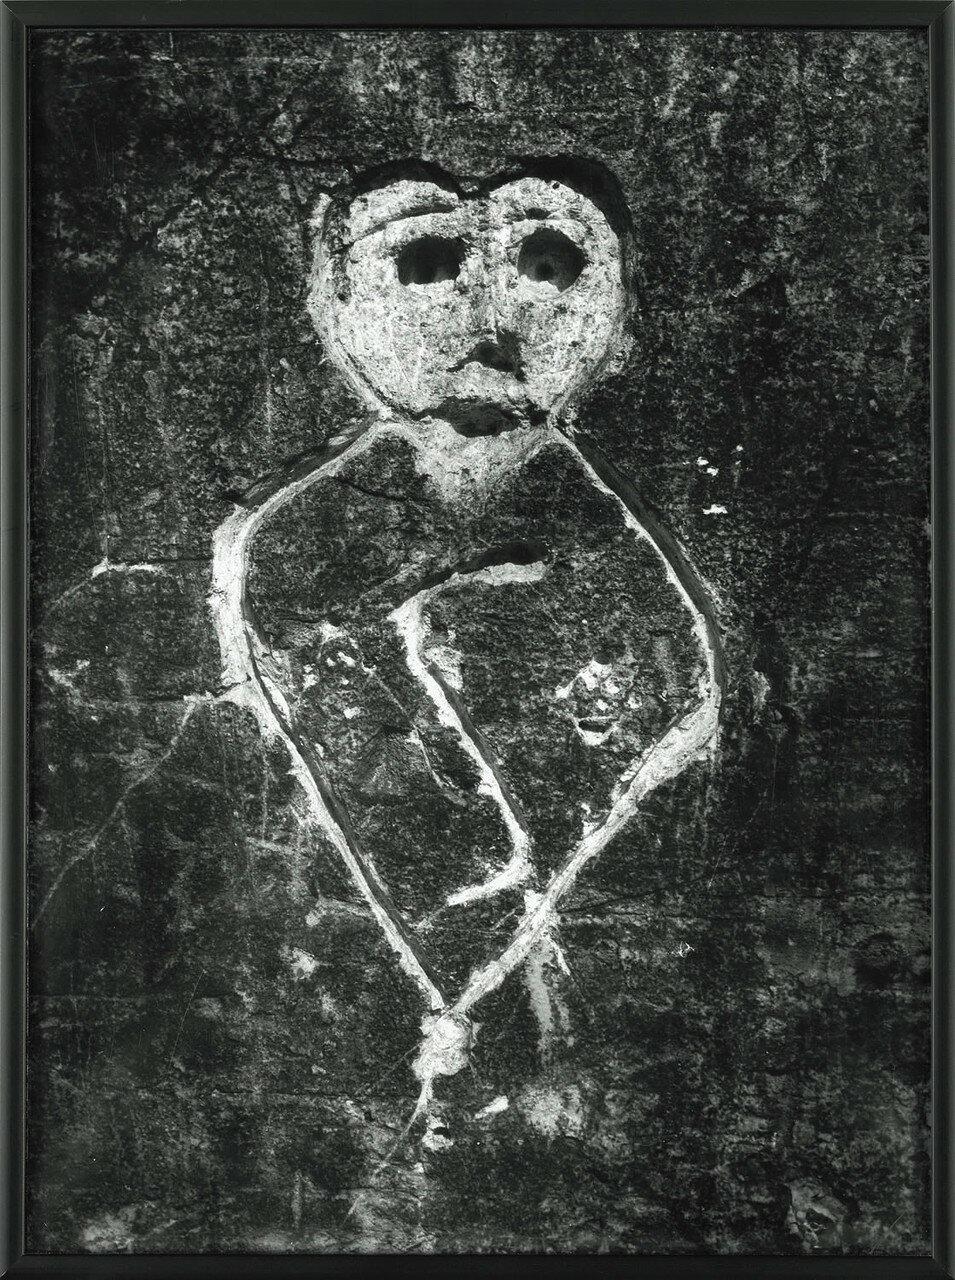 1930. Граффити. Серия VIII Магия. Без названия